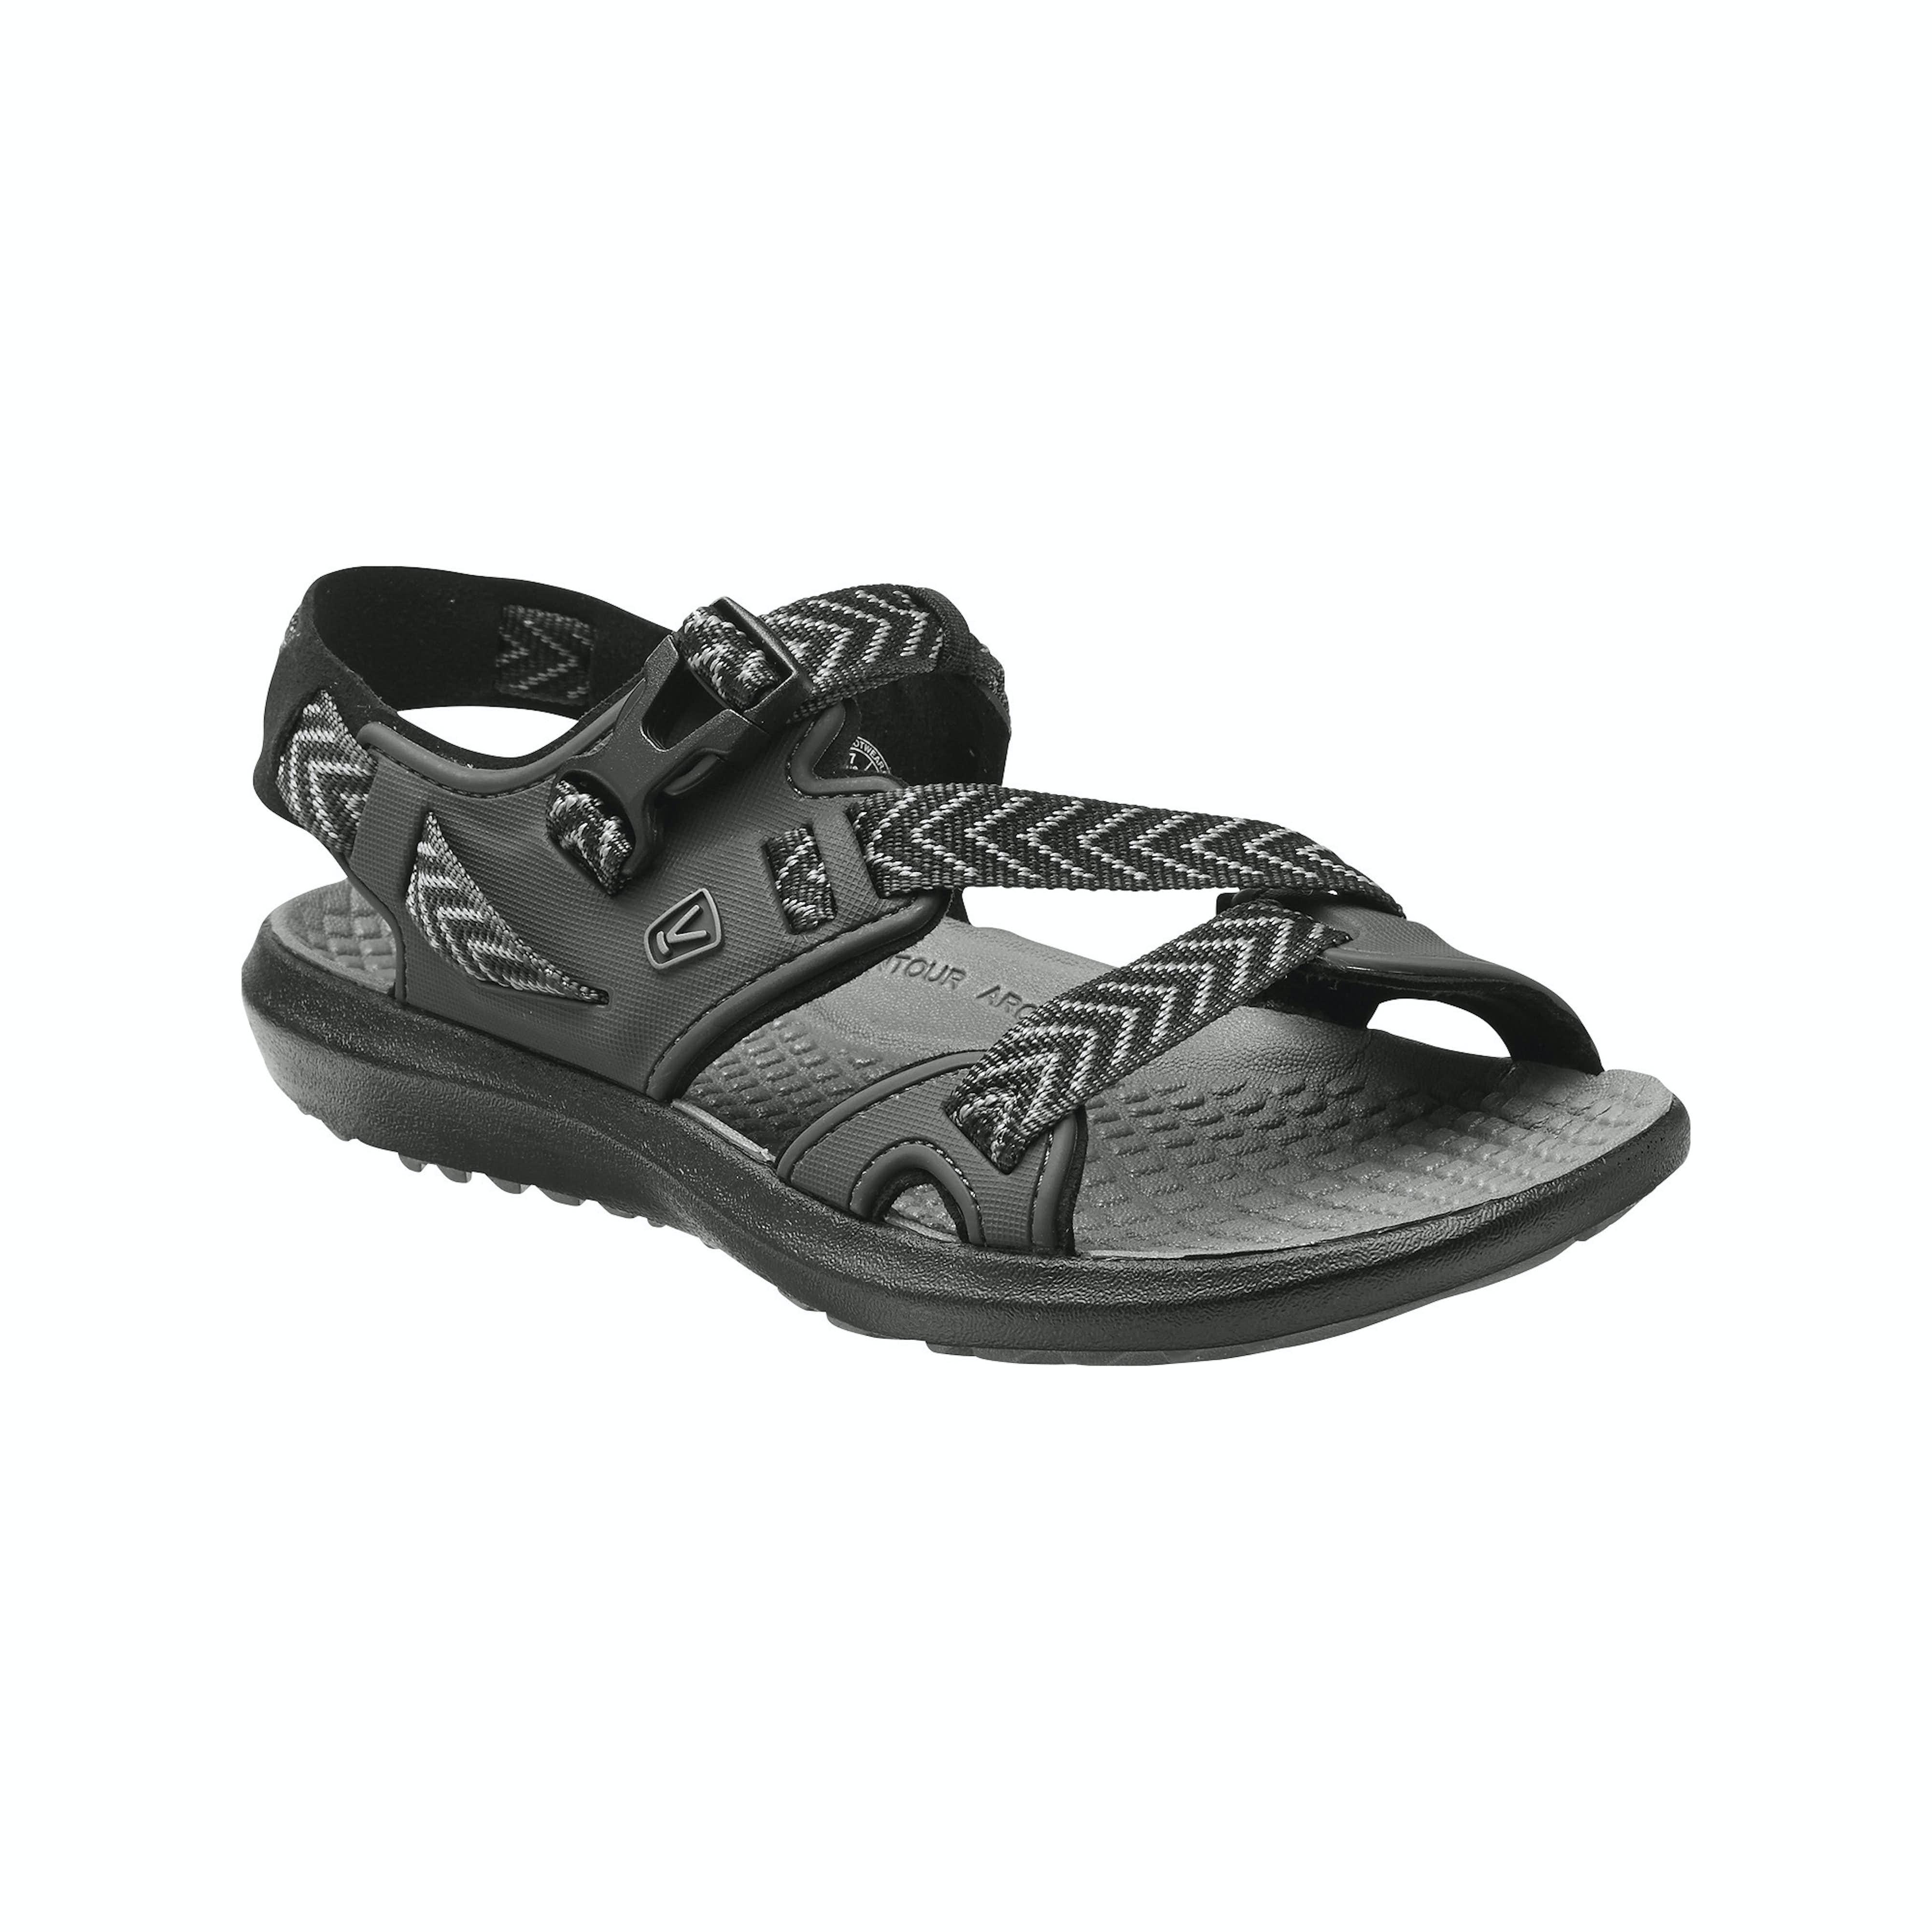 be08a5134d Keen Shoes, Sandals, Boots for women & men | Kathmandu AU